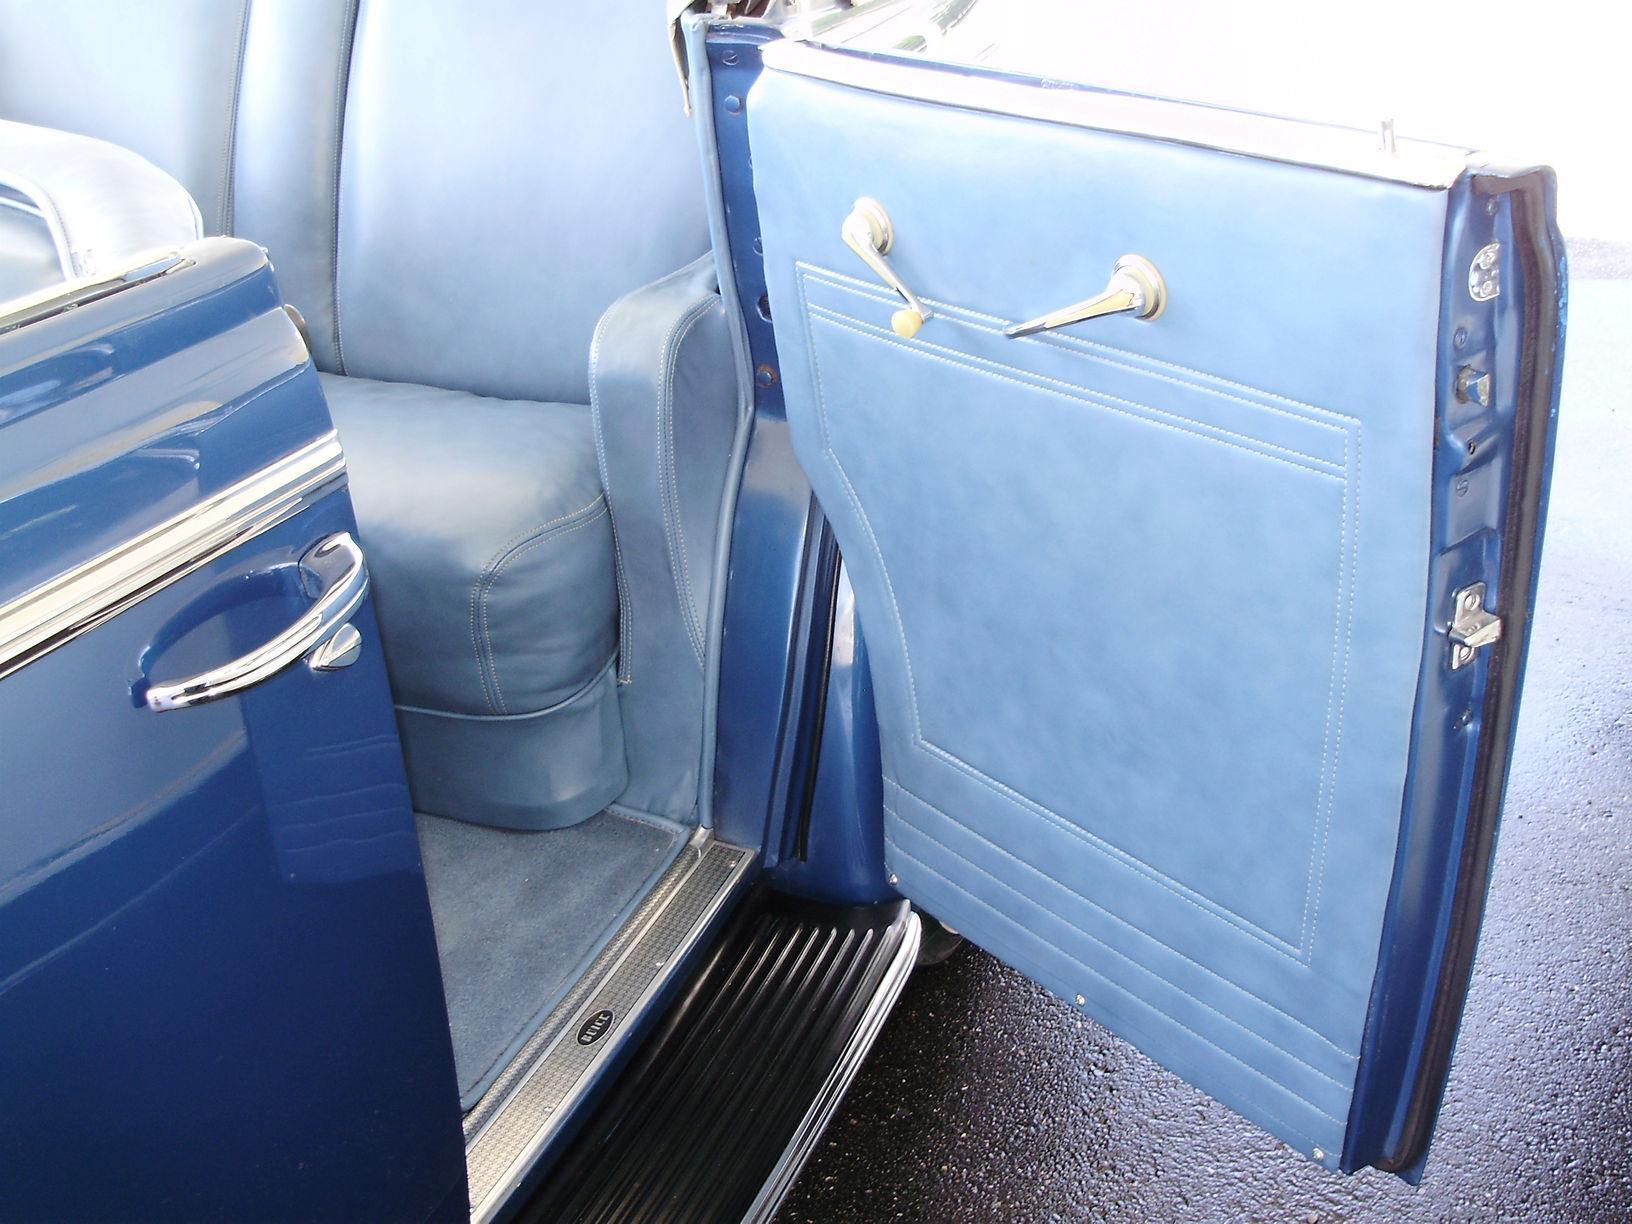 1940 BUICK CENTURY CONVERTIBLE SEDAN - Vintage Motors of Sarasota Inc. #37